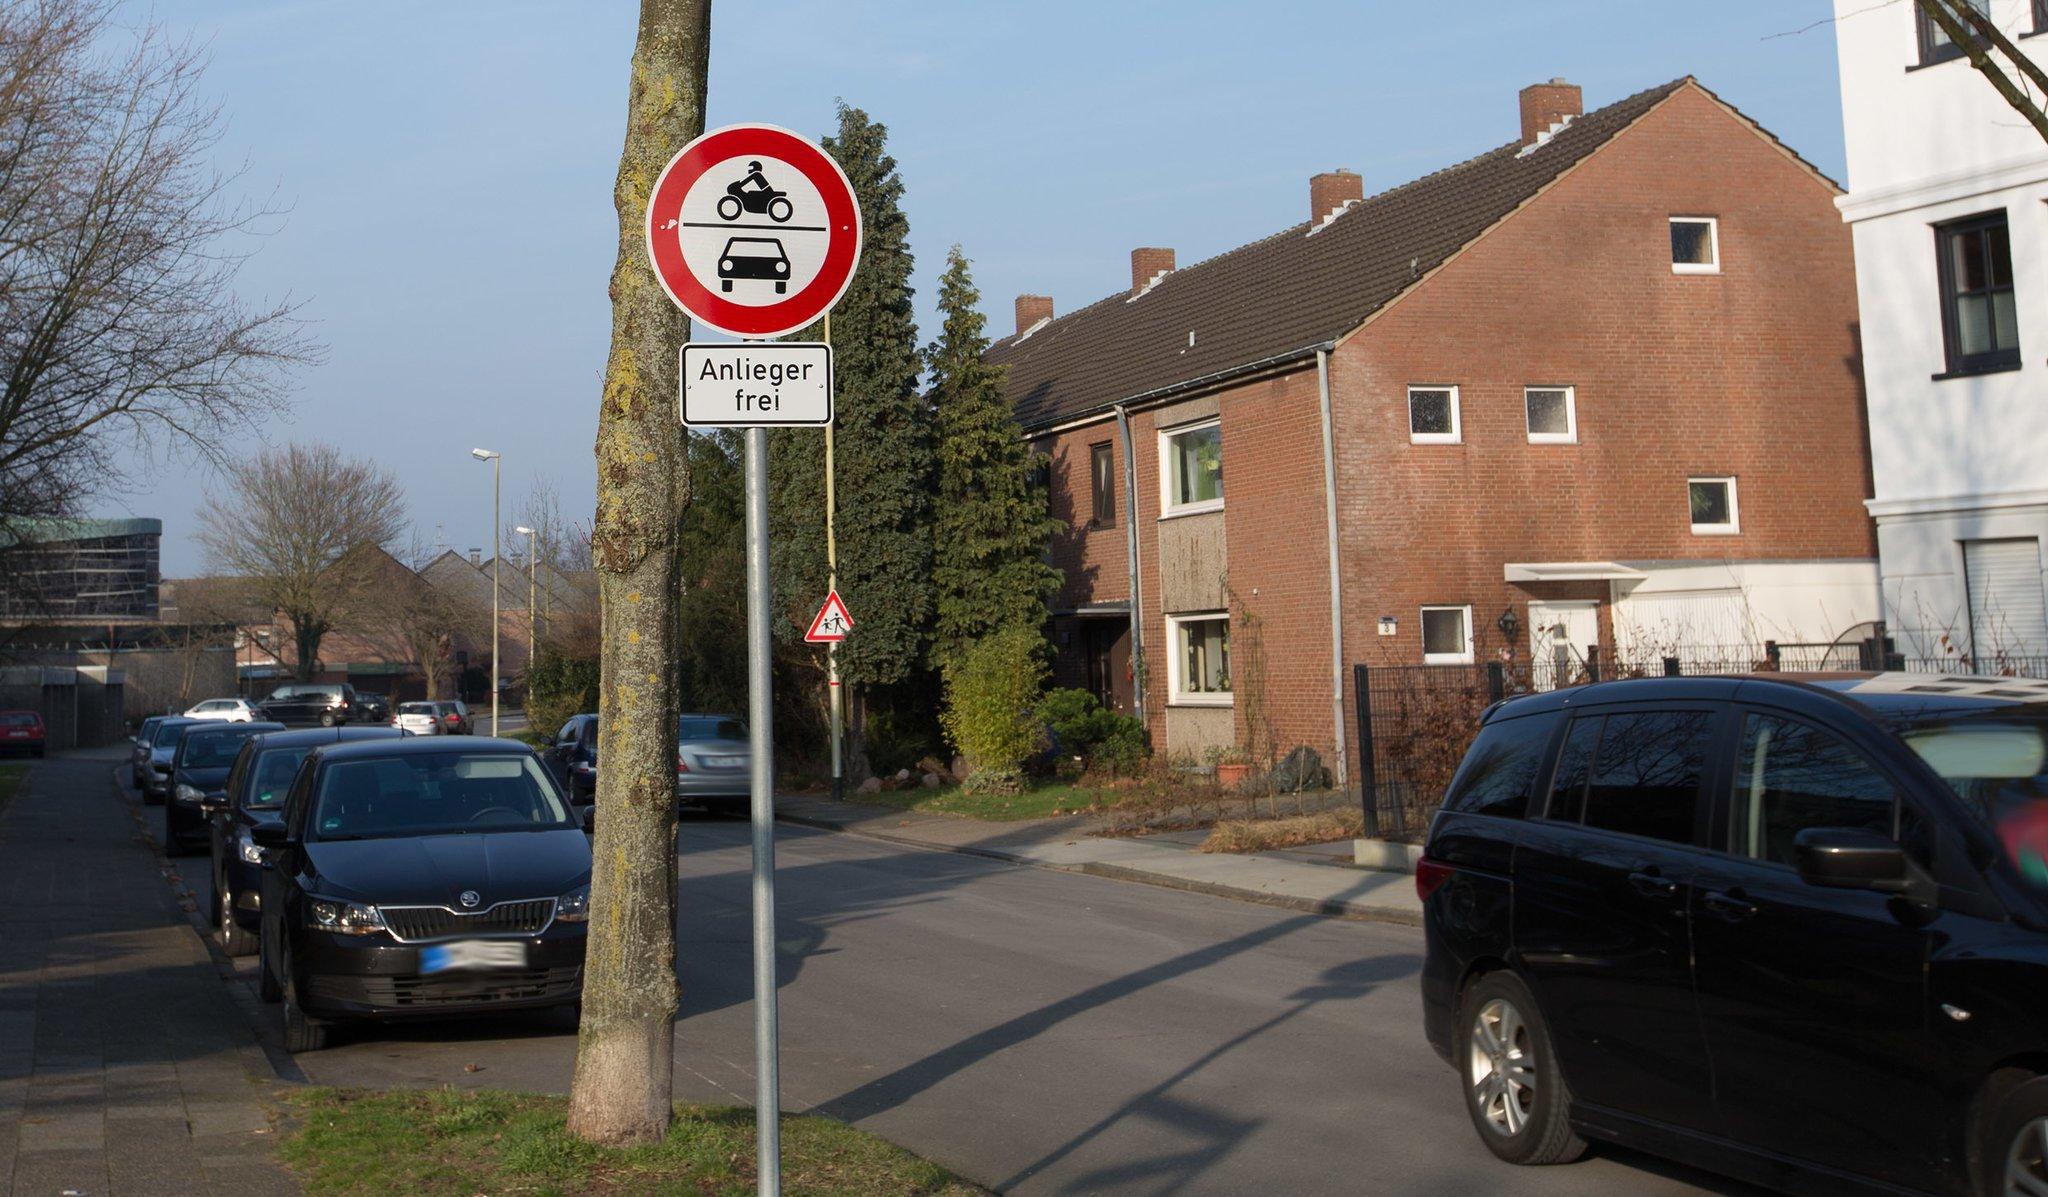 Durchfahrt verboten – Anlieger Frei - Moers